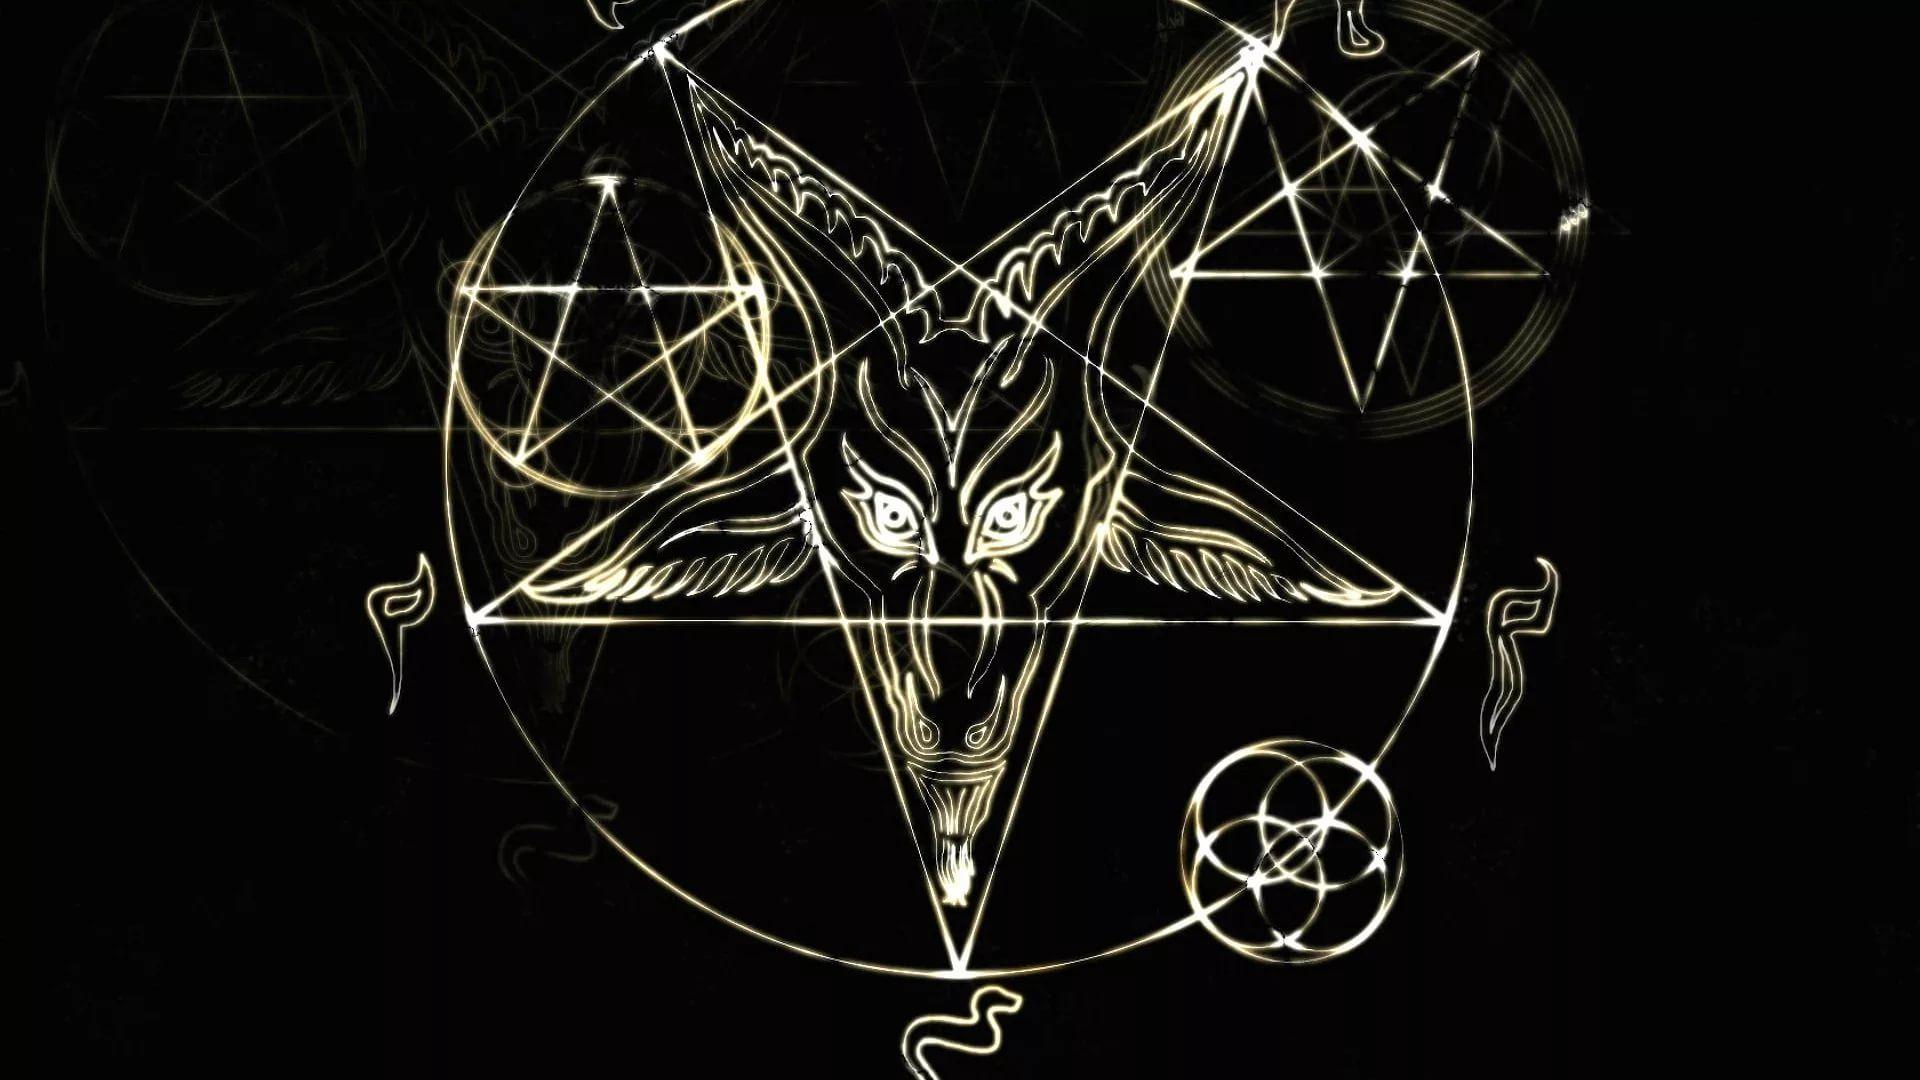 Satanic Hd Wallpapers 30 Images Wallpaperboat